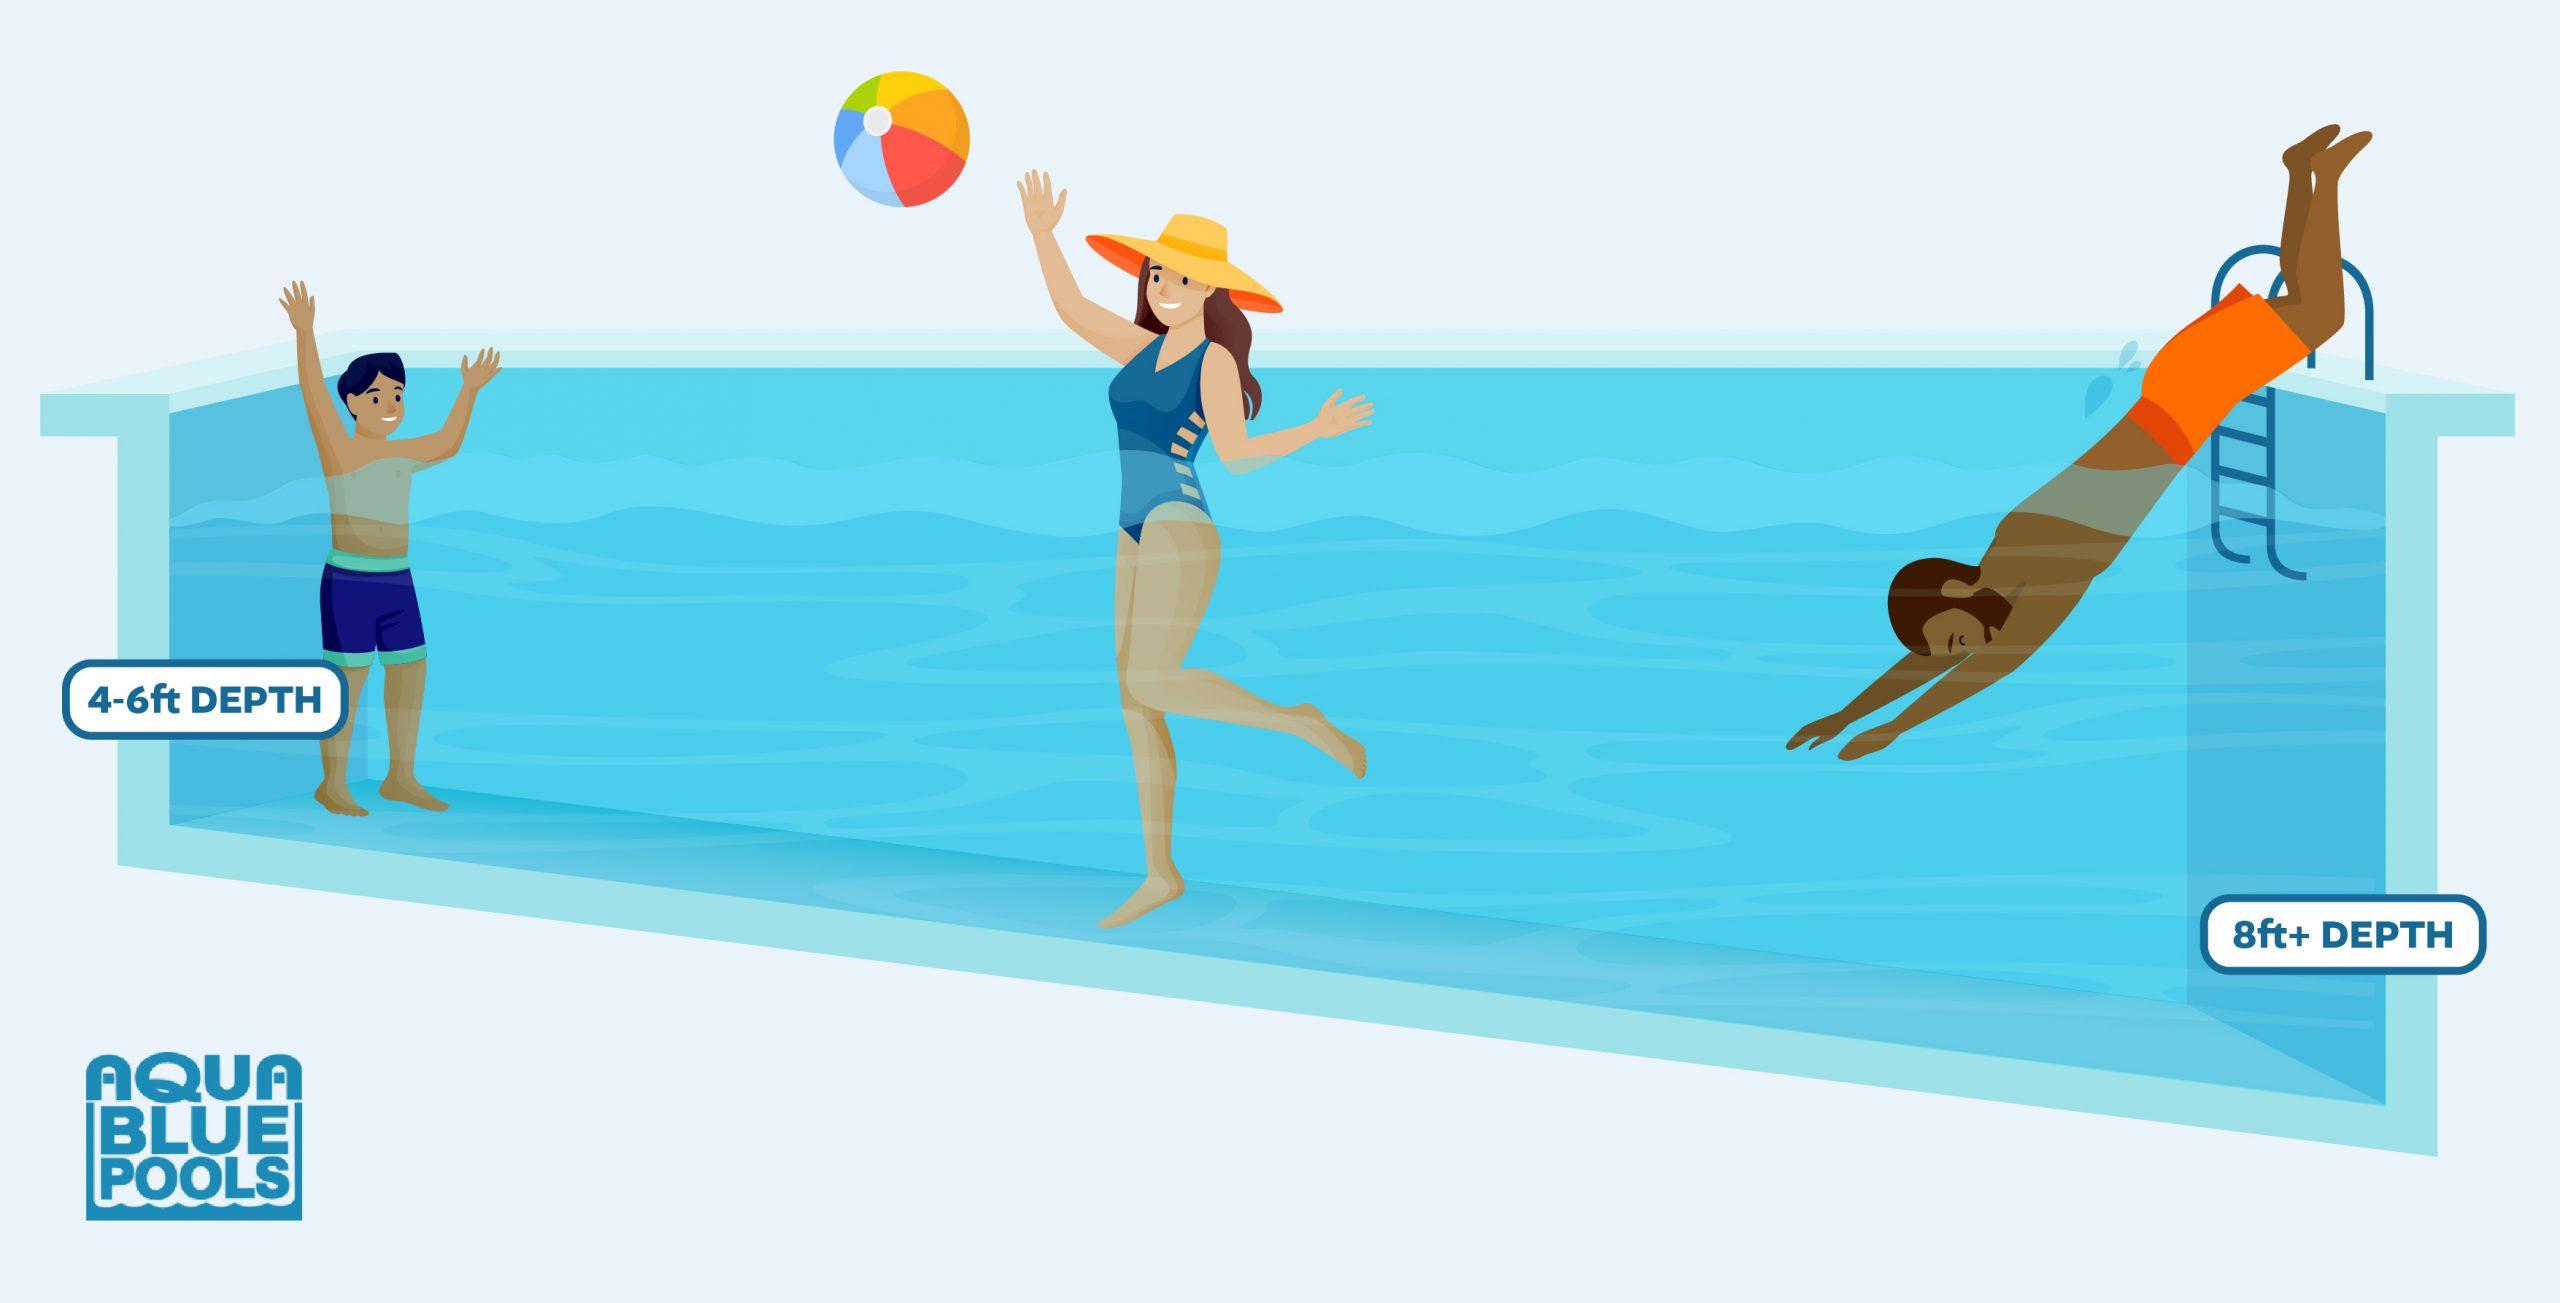 How Deep Should My Pool Be? Aqua Blue Pools Graphic